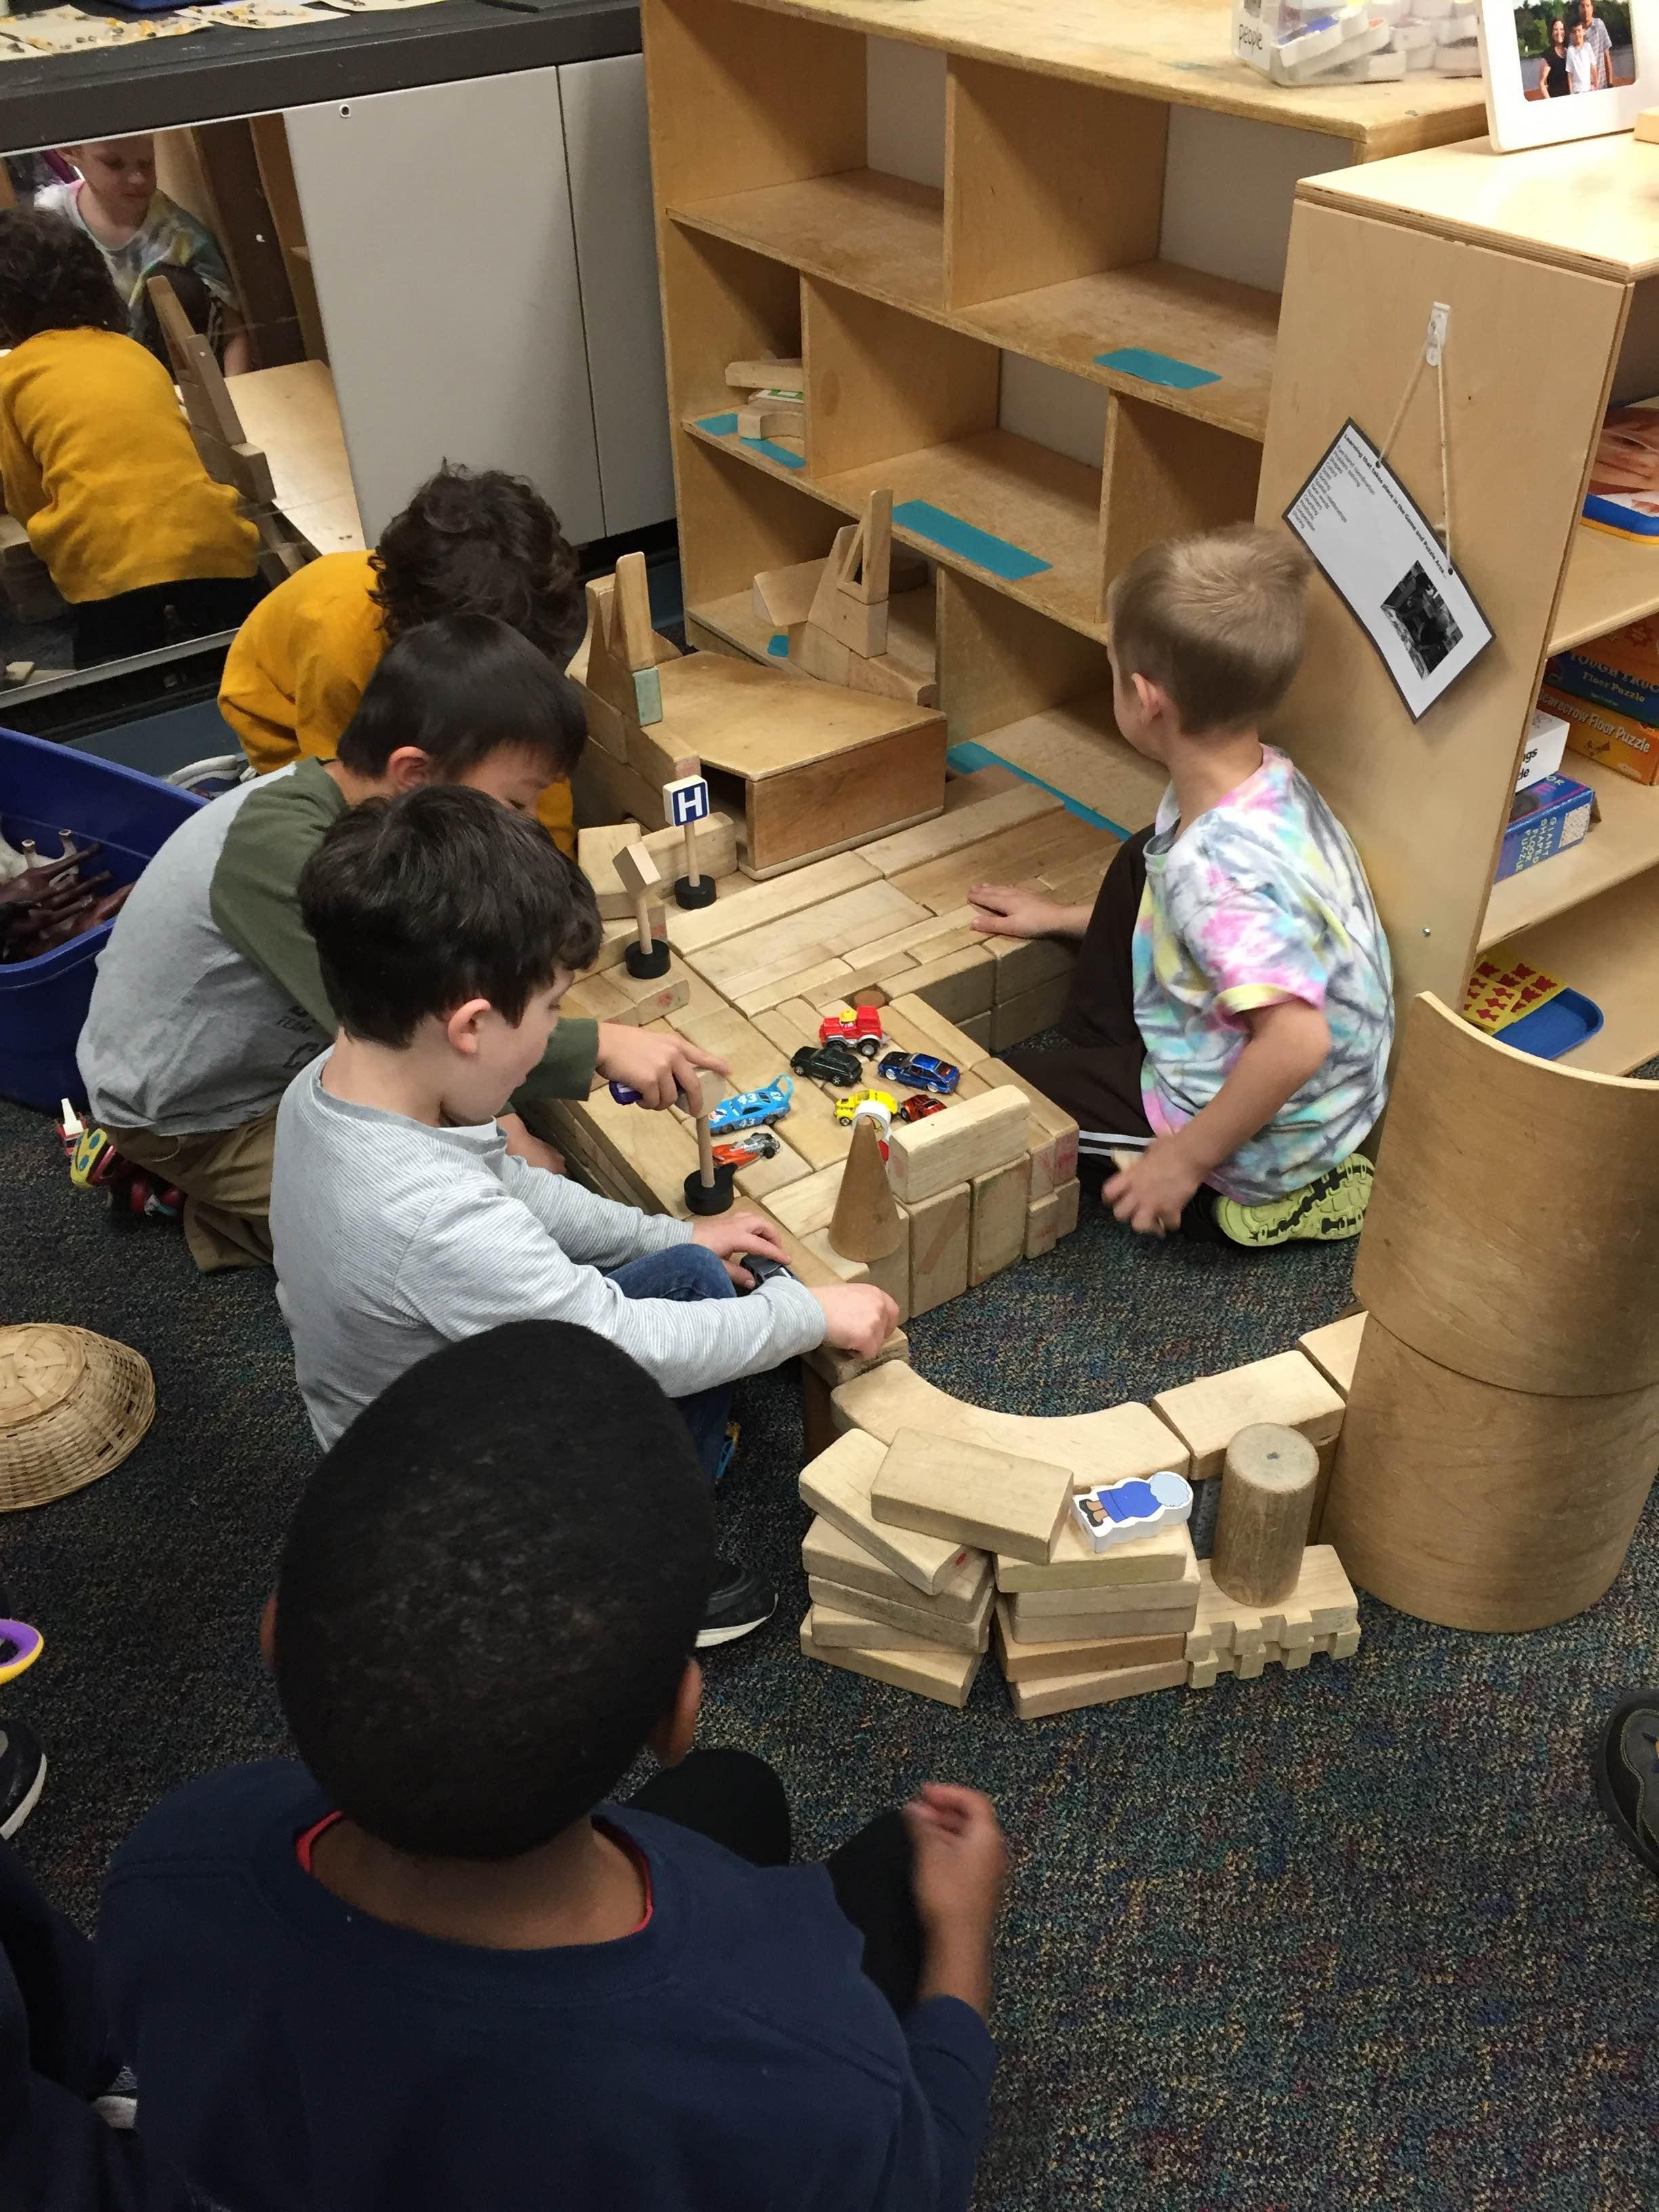 Boys building with blocks.